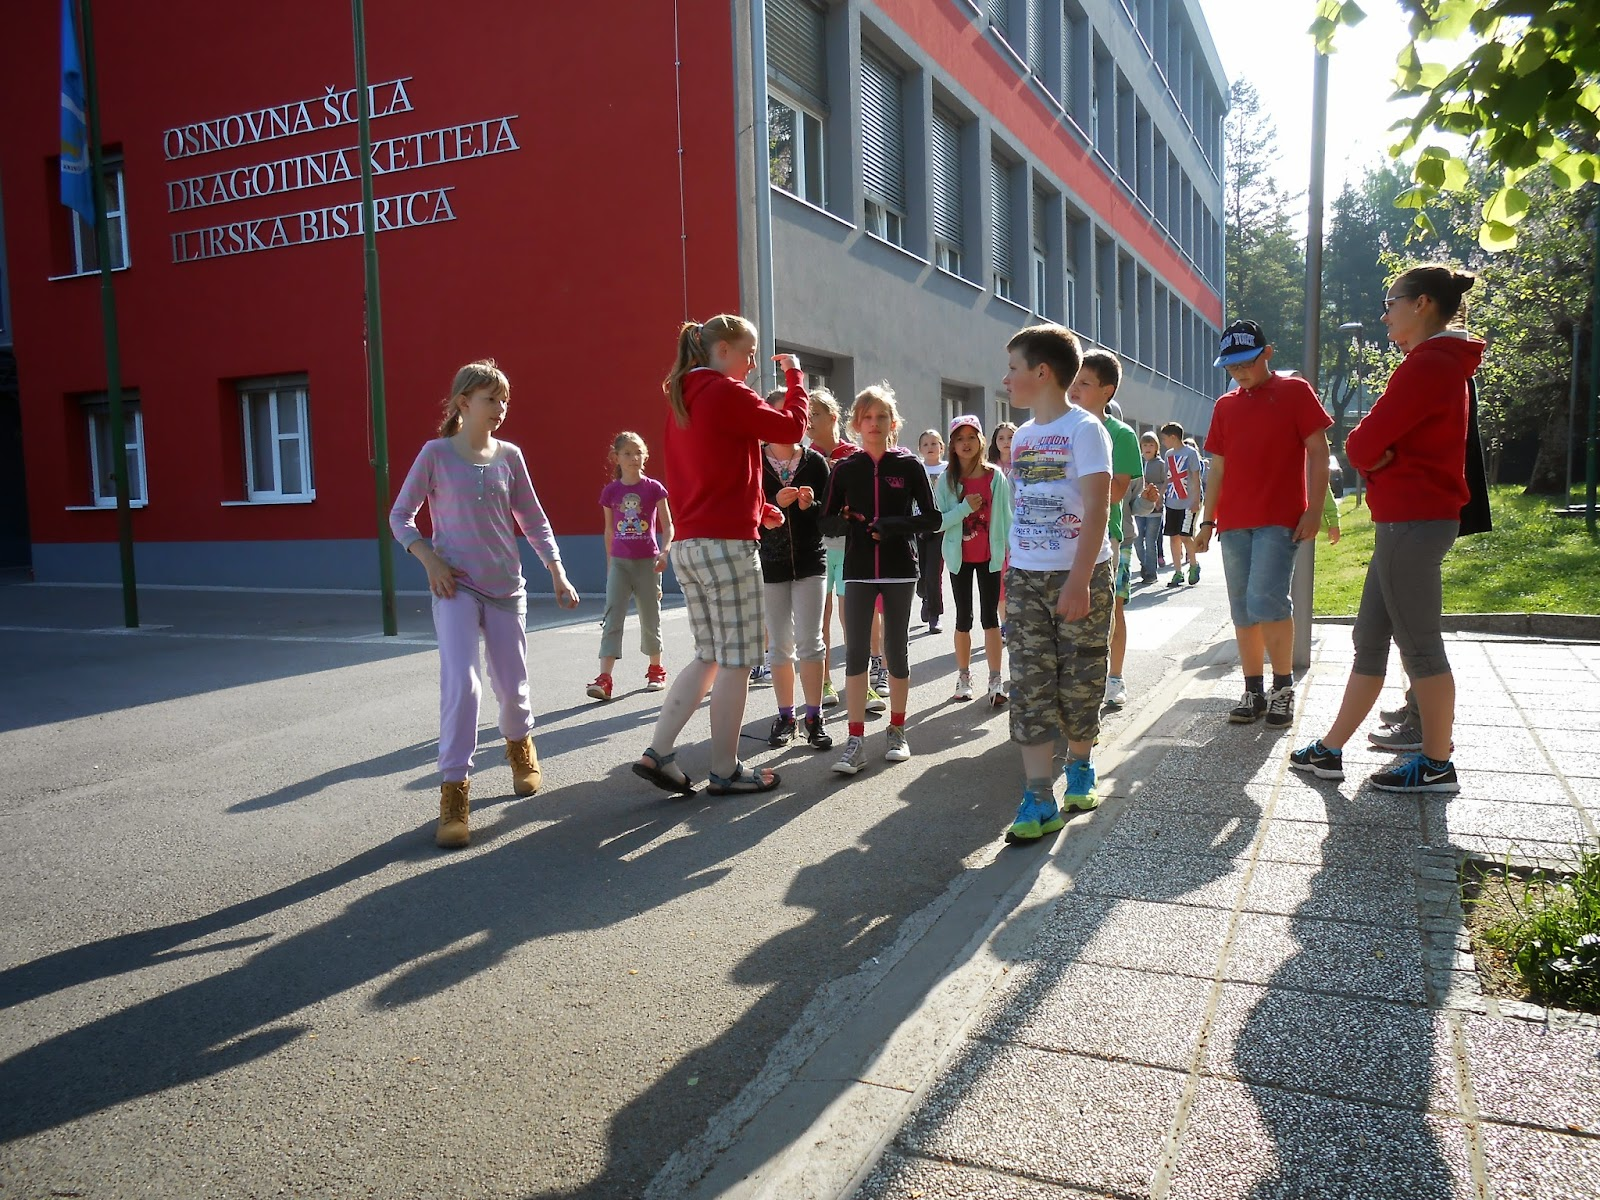 Športni dan 4. a in 4. b, Ilirska Bistrica, 19. 5. 2015 - DSCN4627.JPG